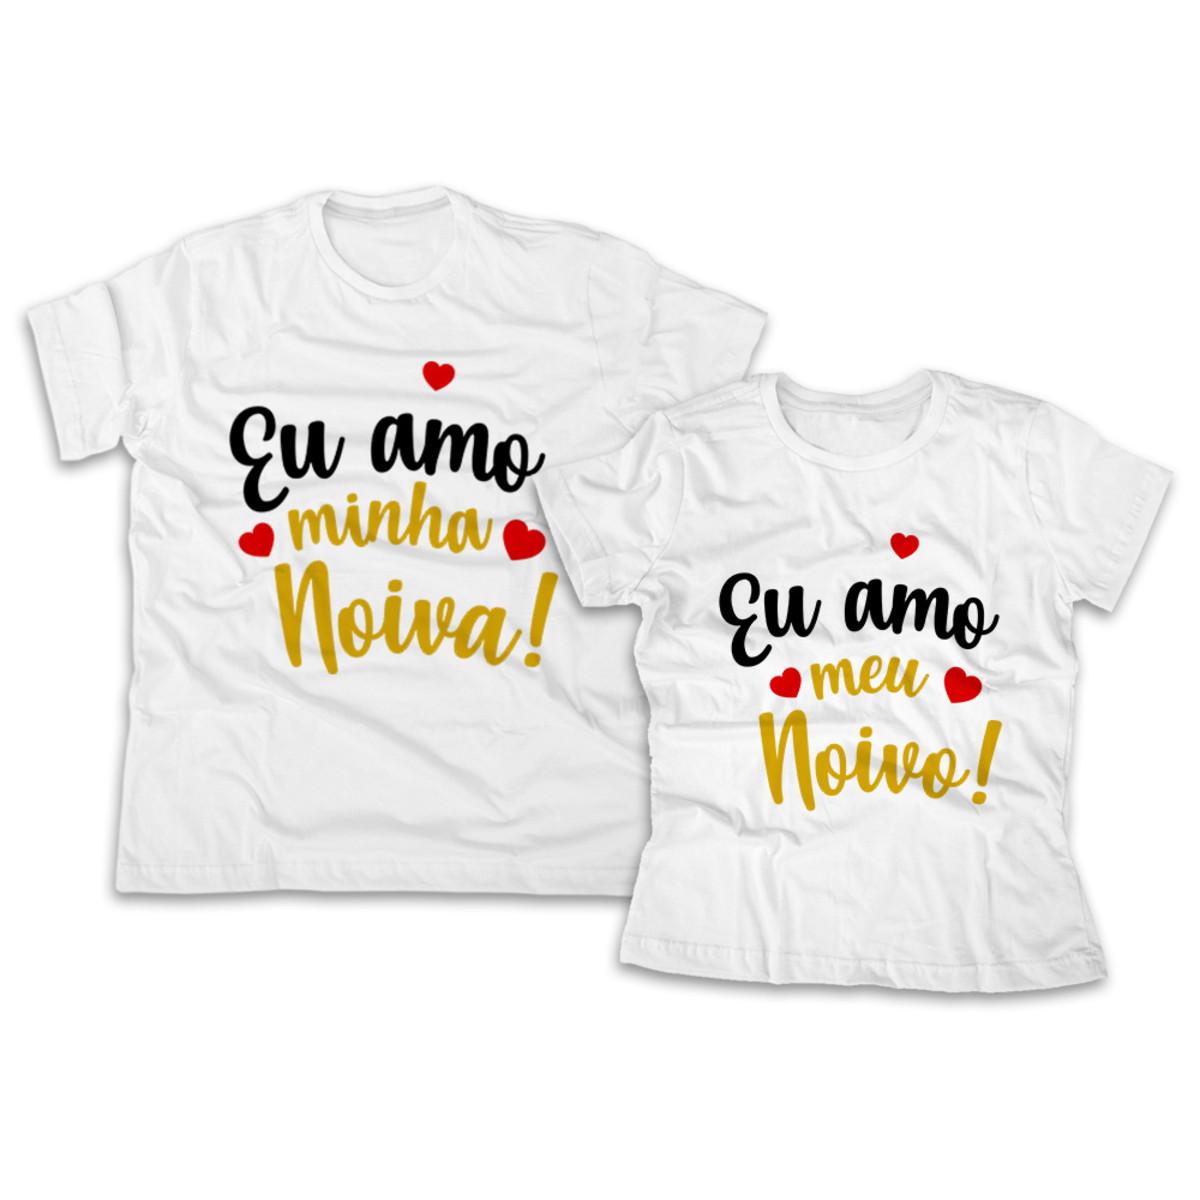 b19a046c9c Camiseta Personalizada para Noivos no Elo7